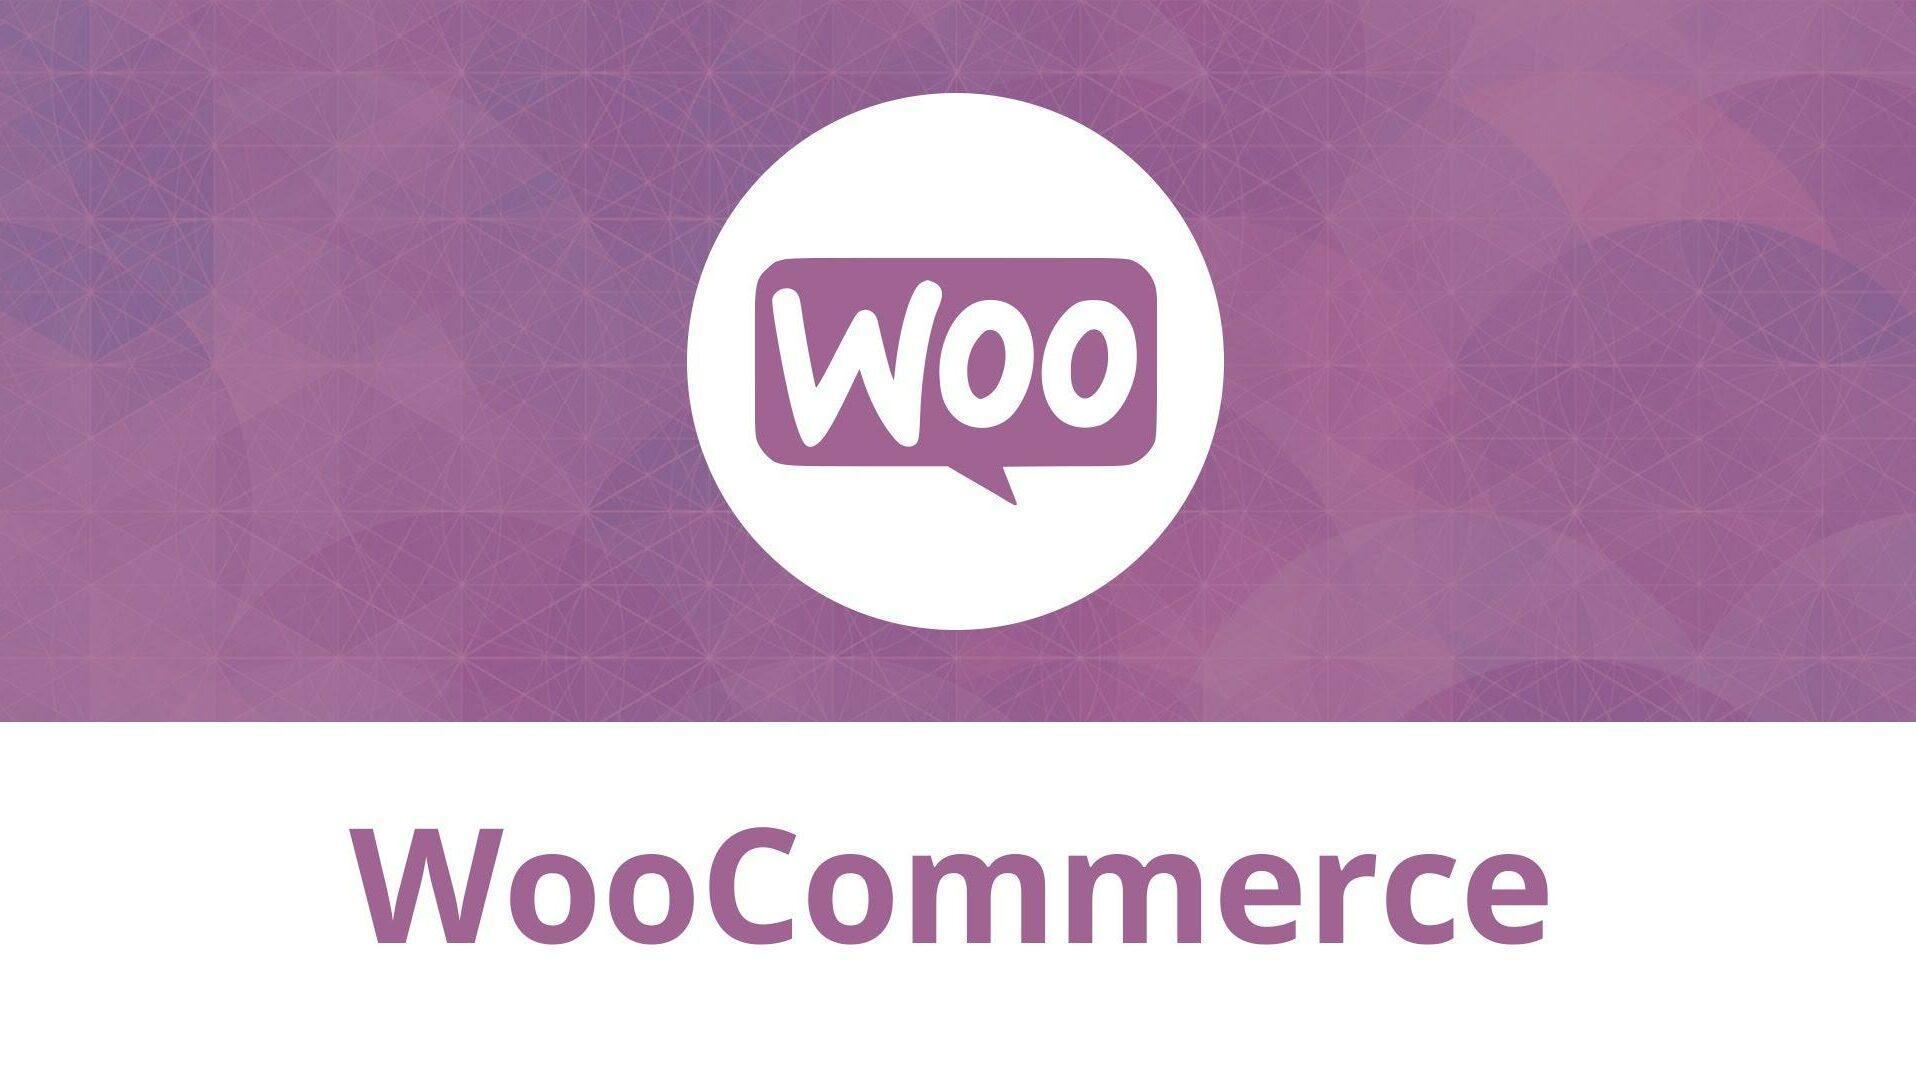 woocommerce la gi 1 edited